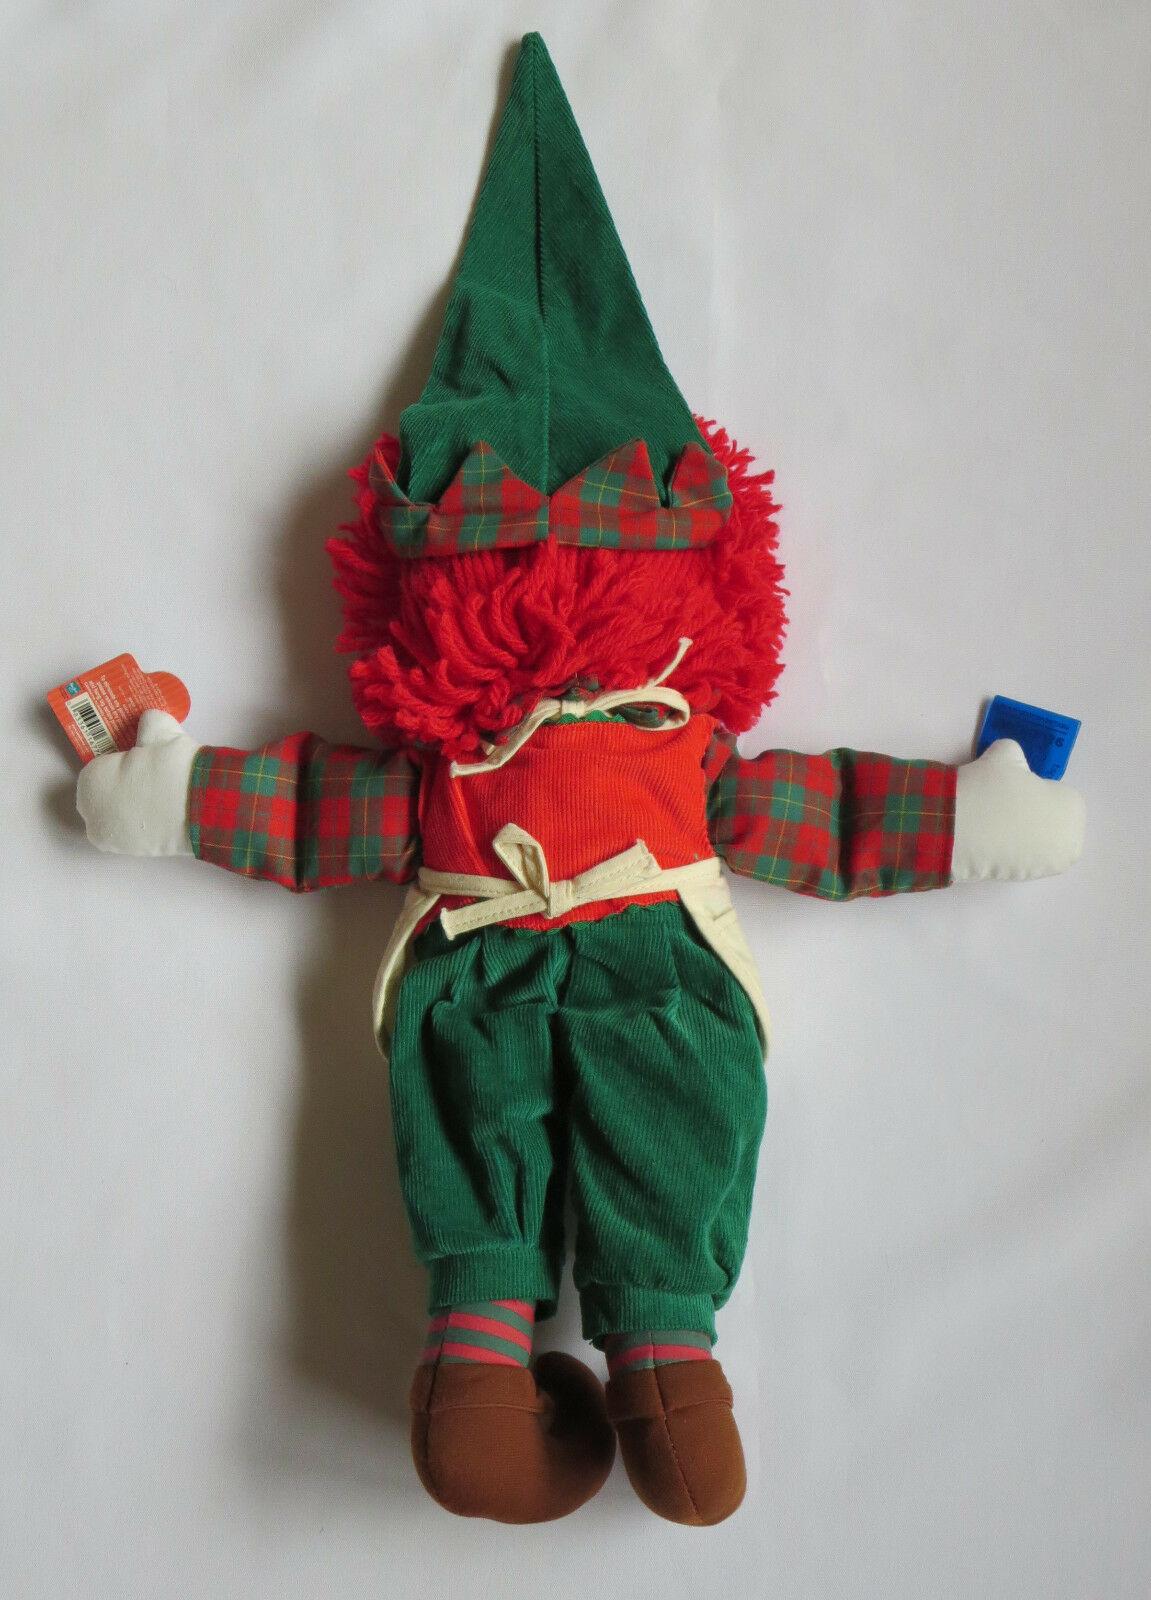 RAGGEDY ANN Plush Doll Elf Applause Apron Christmas Theme Hat Slippers image 2